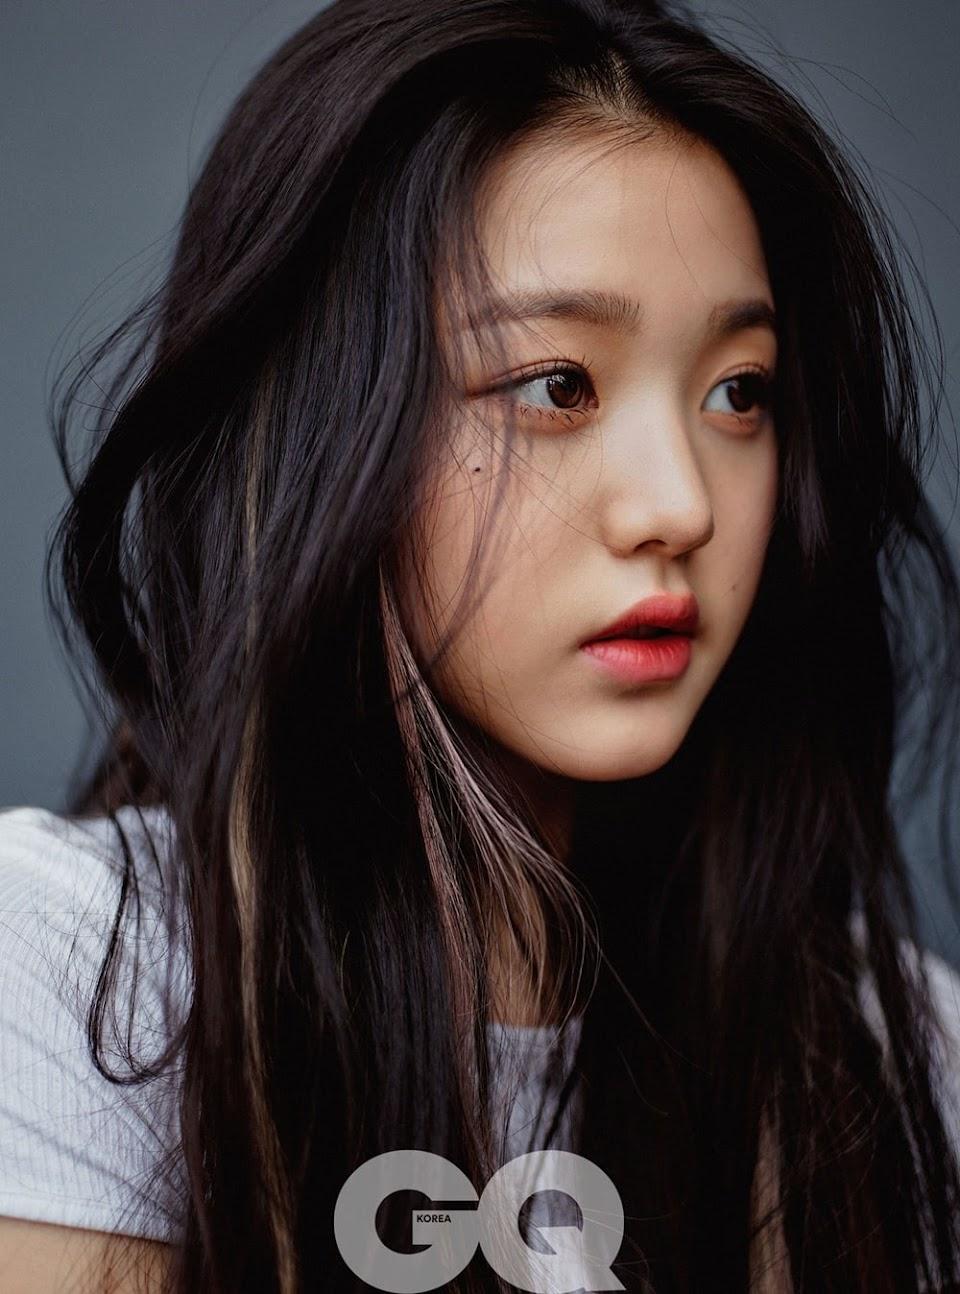 IZONE-Jang-Won-Young